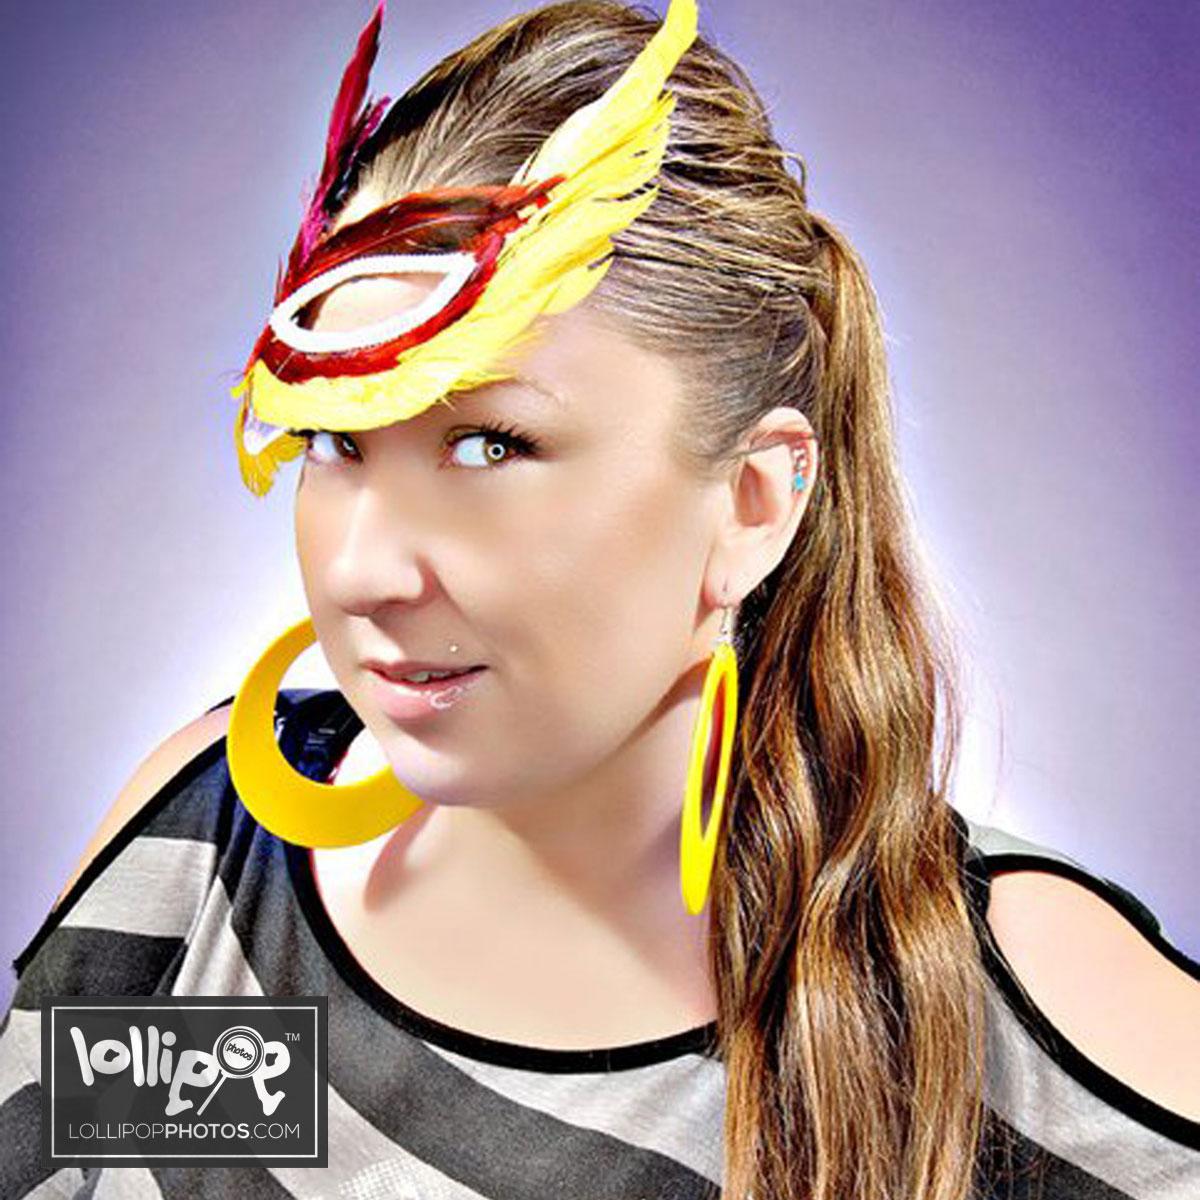 msdig-nora-canfield-lollipop-photos-519.jpg